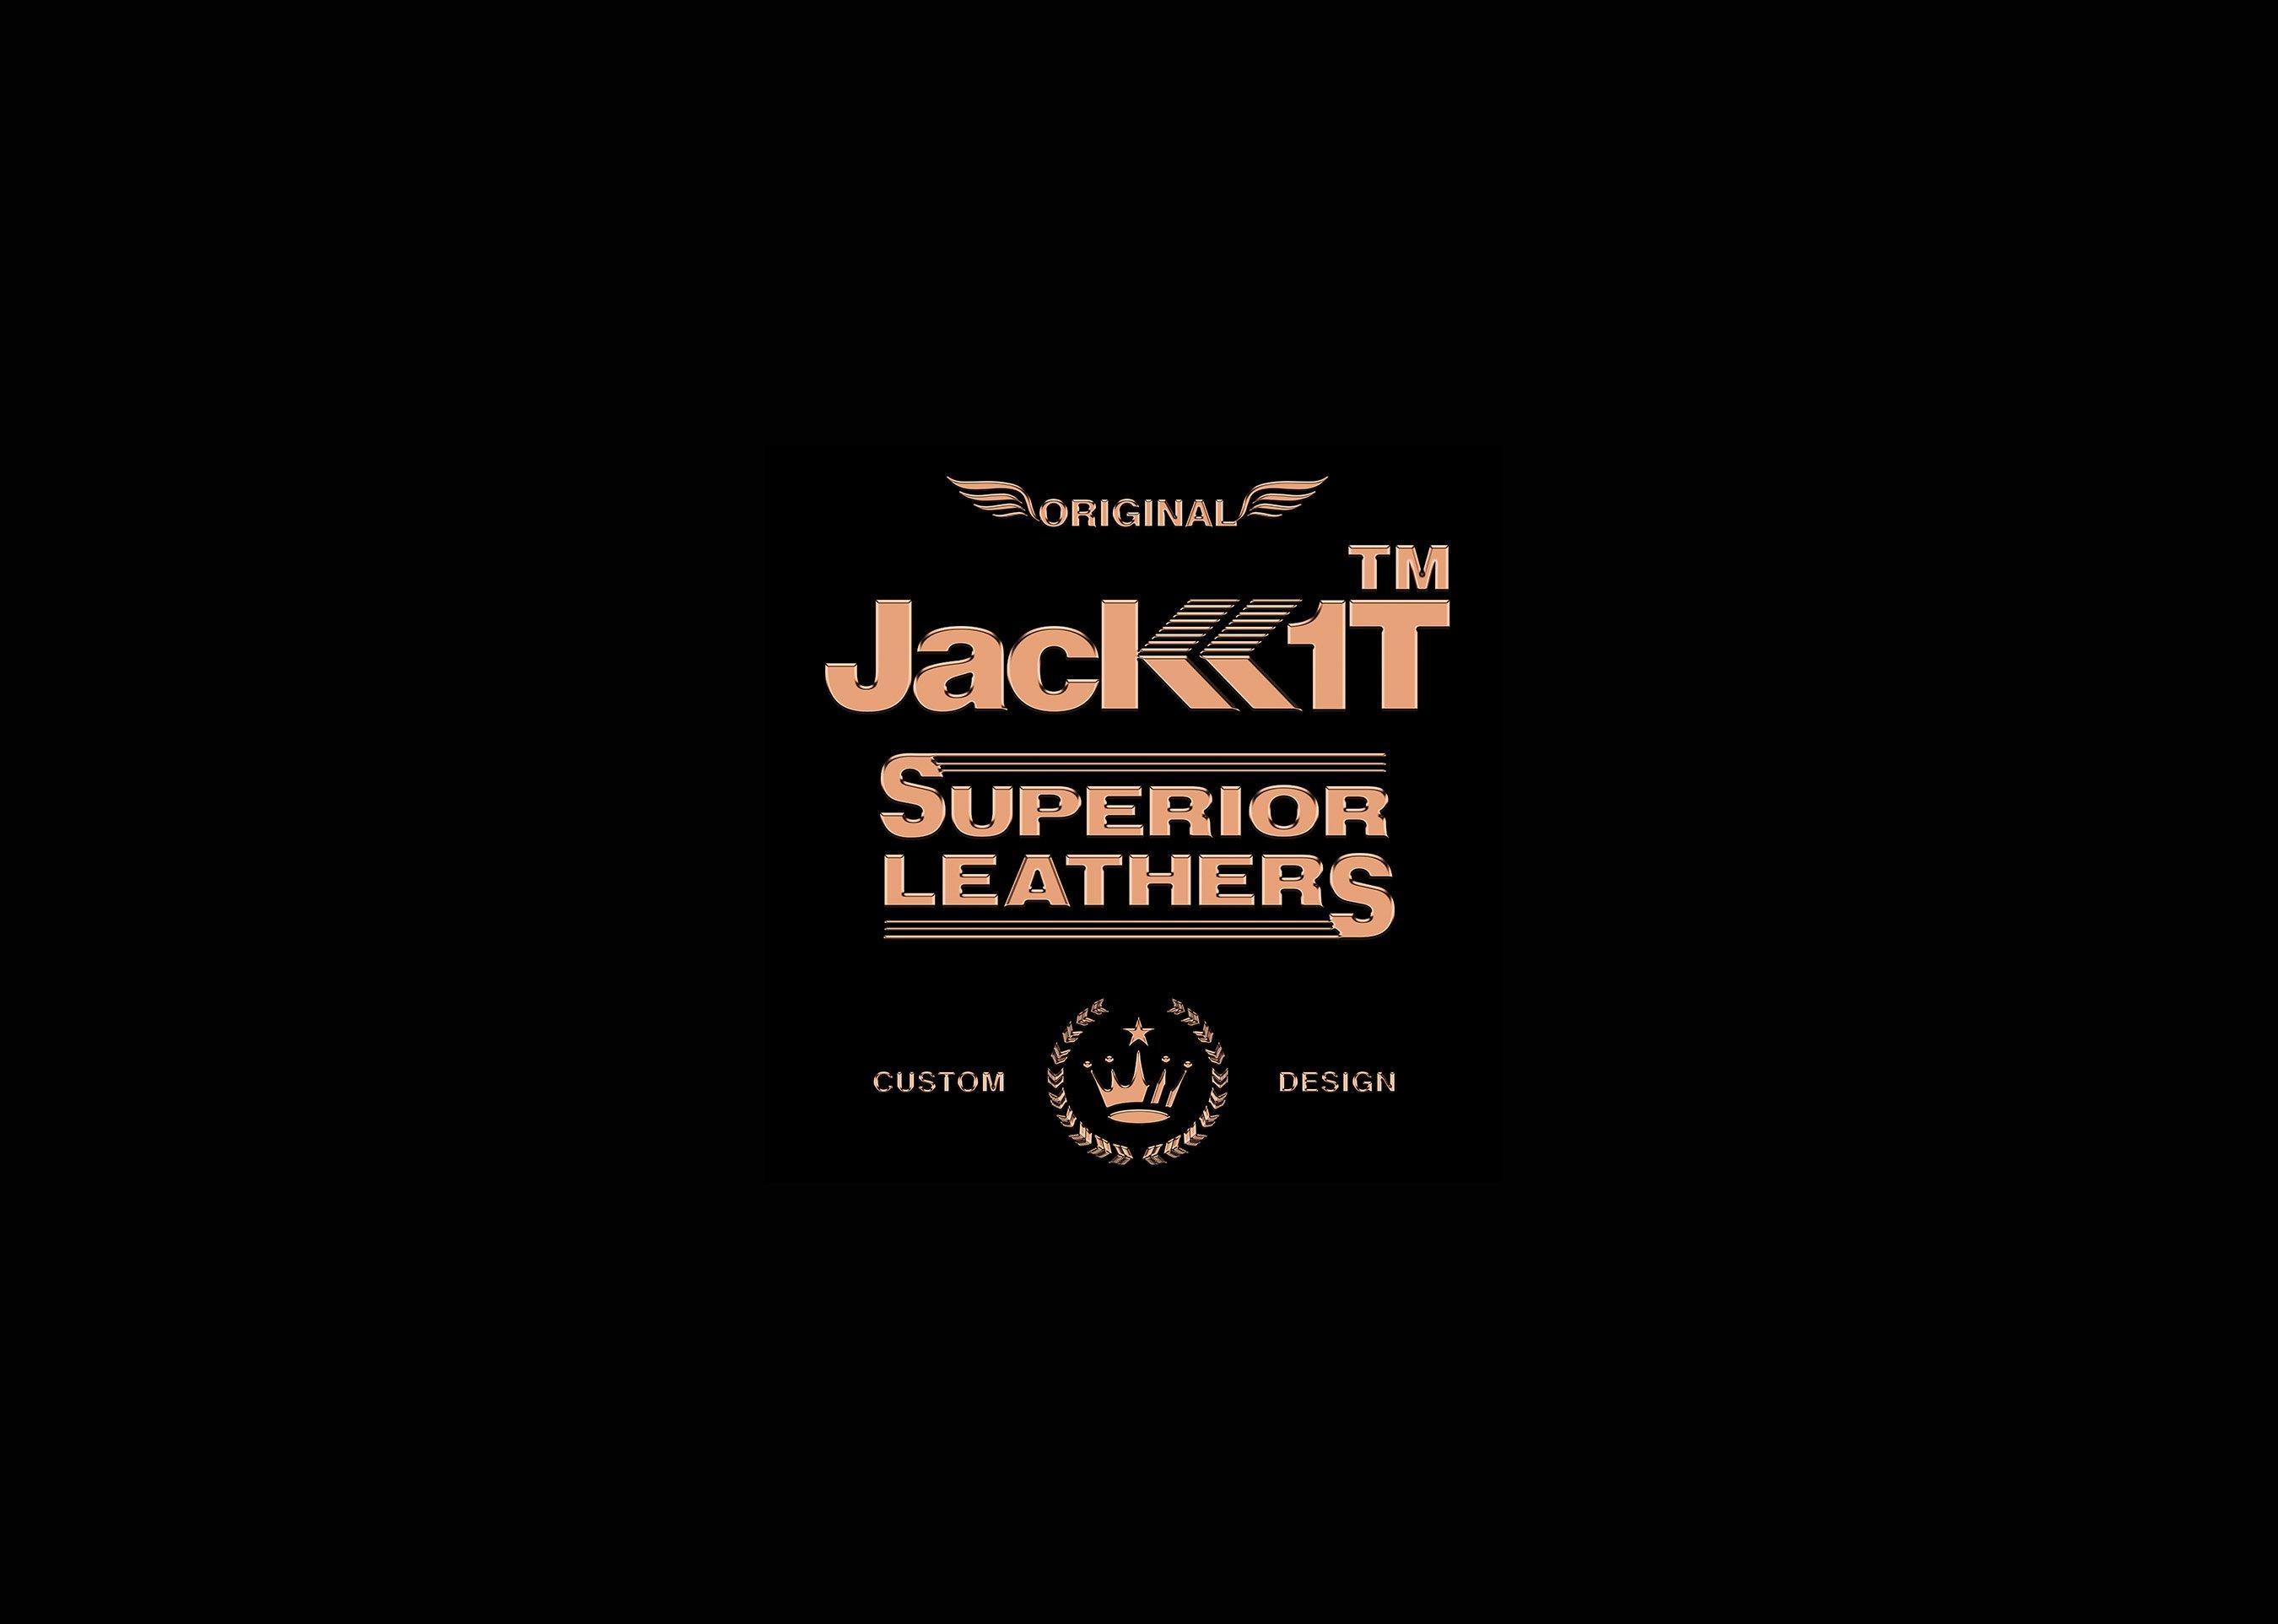 Jack1t™ Leather (FEMME)